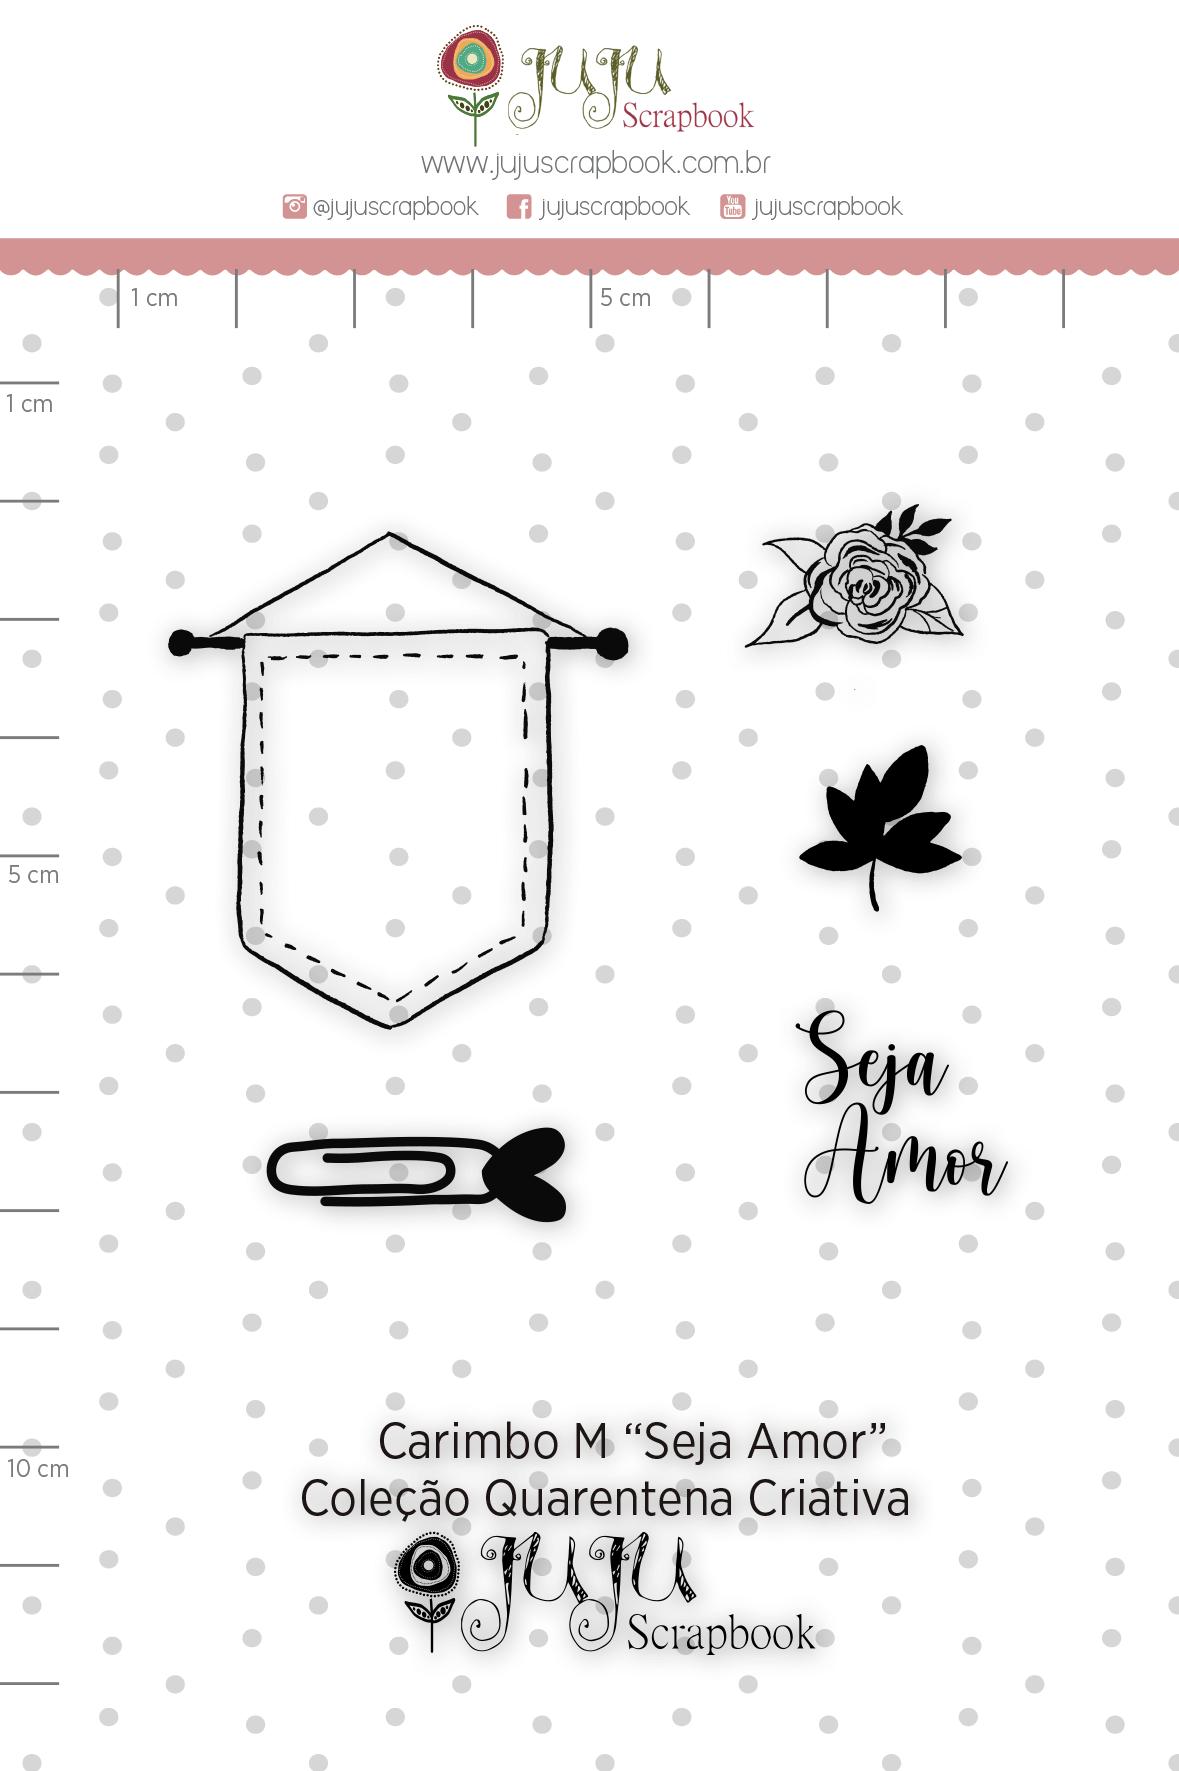 Carimbo M Seja Amor - Coleção Quarentena Criativa - Juju Scrapbook  - JuJu Scrapbook